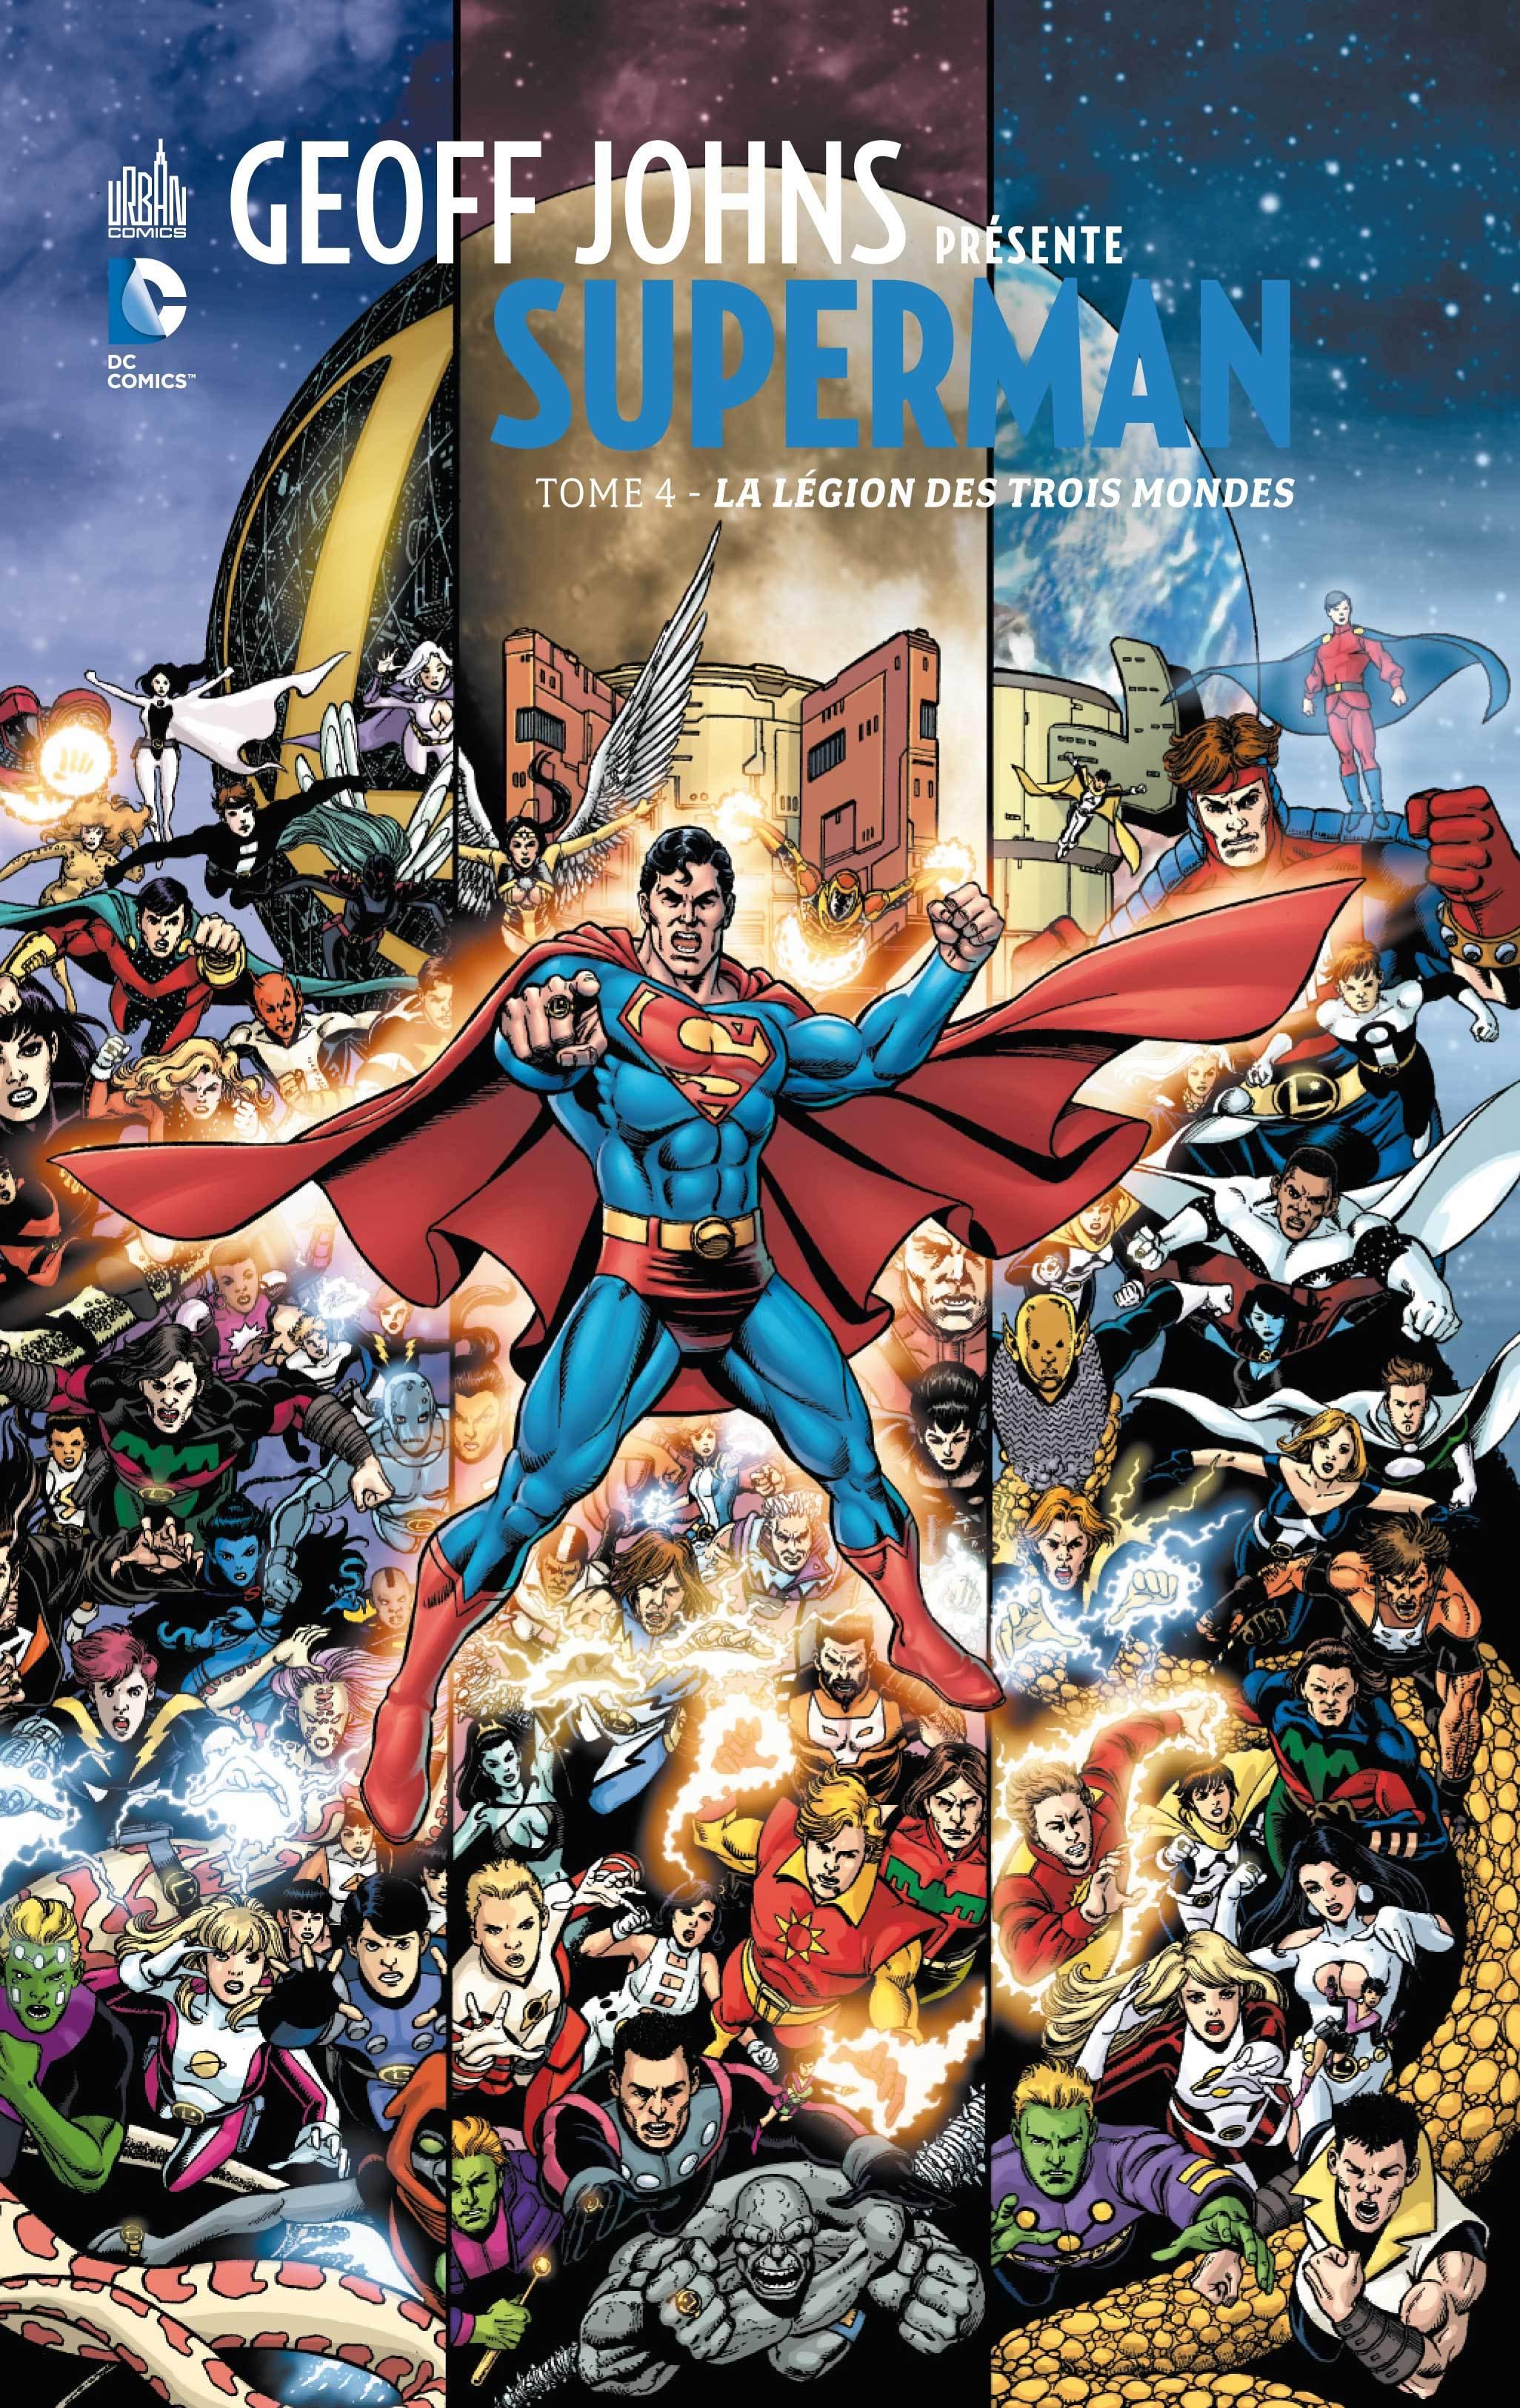 DC SIGNATURES - GEOFF JOHNS PRESENTE SUPERMAN TOME 4